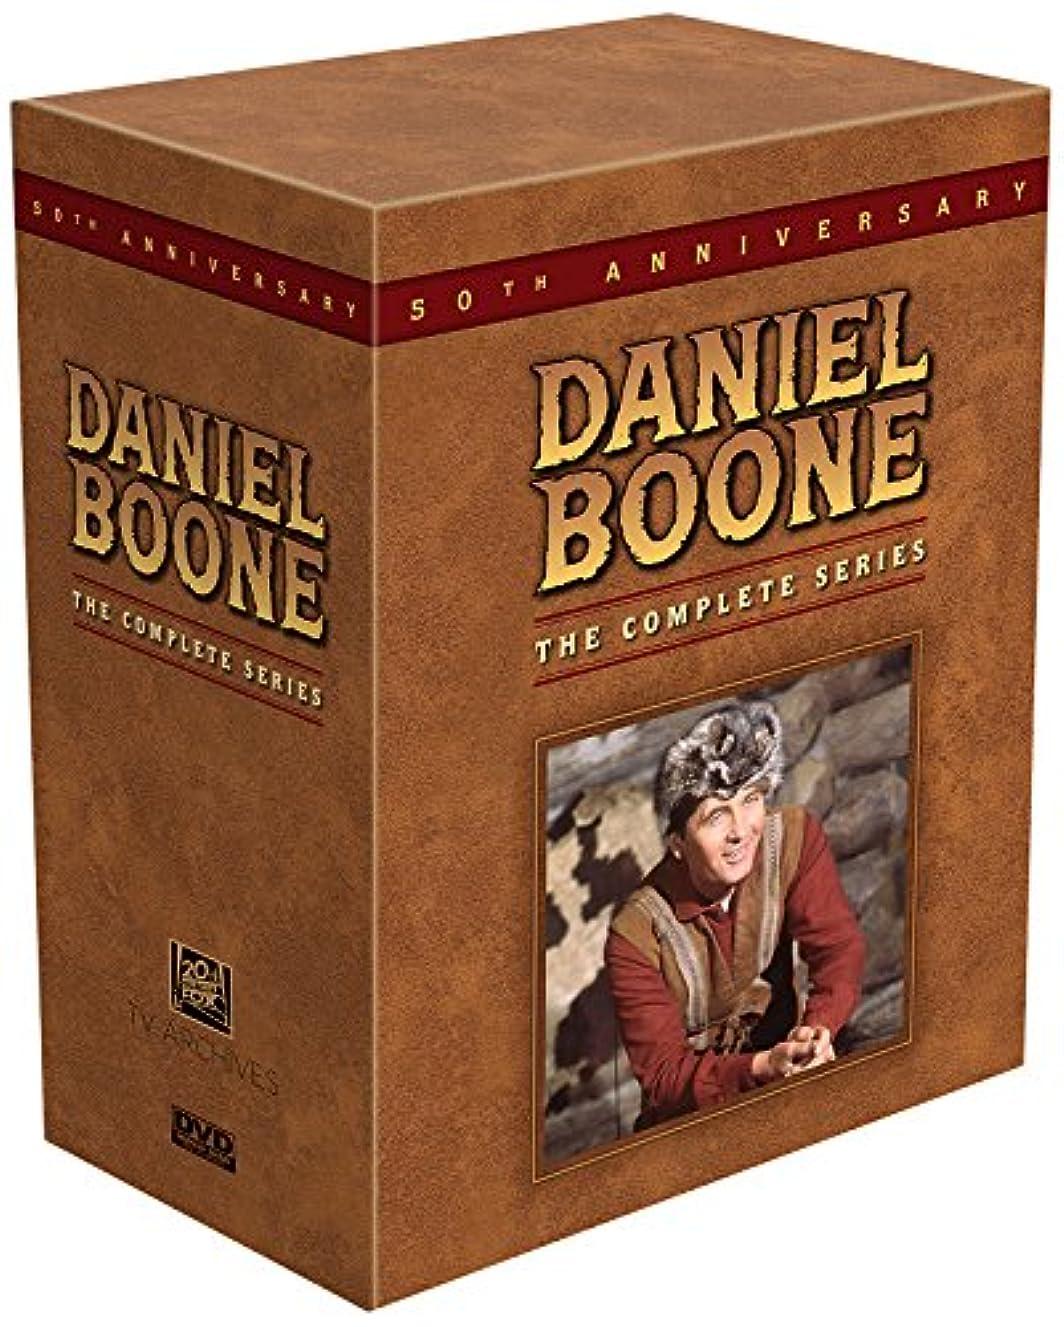 Daniel Boone: The Complete Series